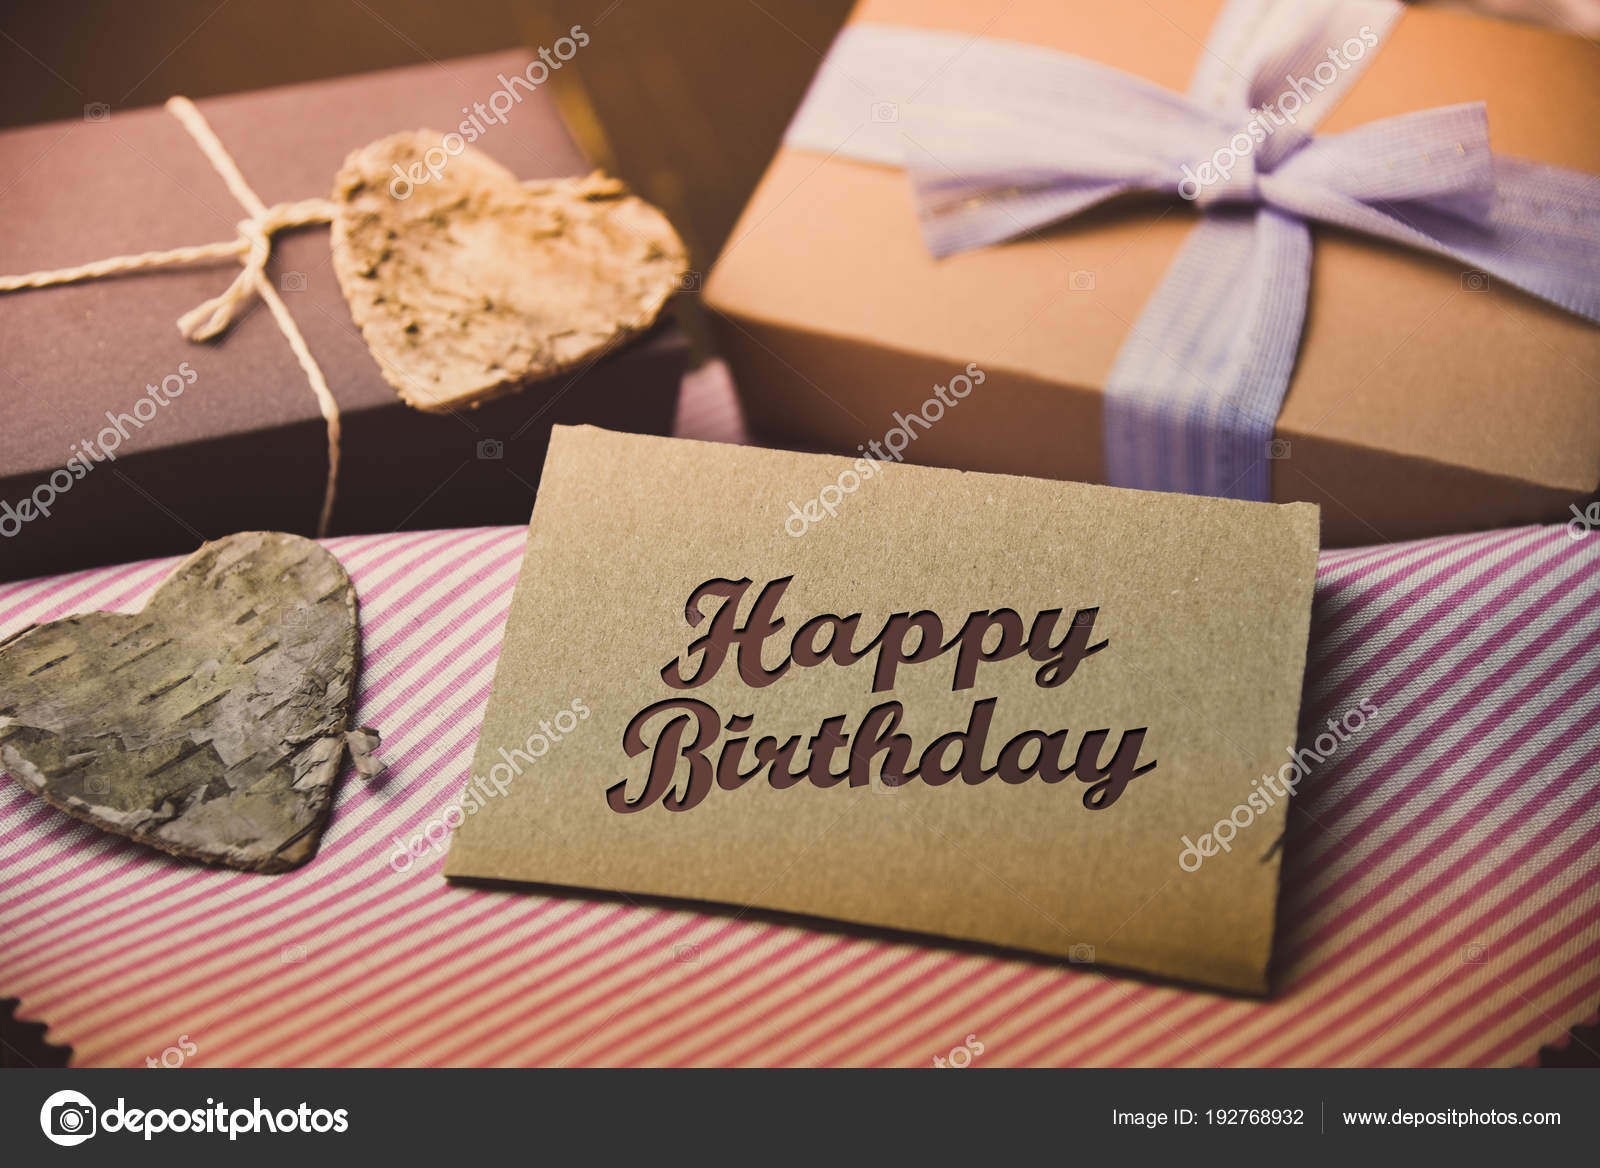 Happy Birthday present gift hipster vintage man u2014 Stock Photo & Happy Birthday present gift hipster vintage man u2014 Stock Photo ...